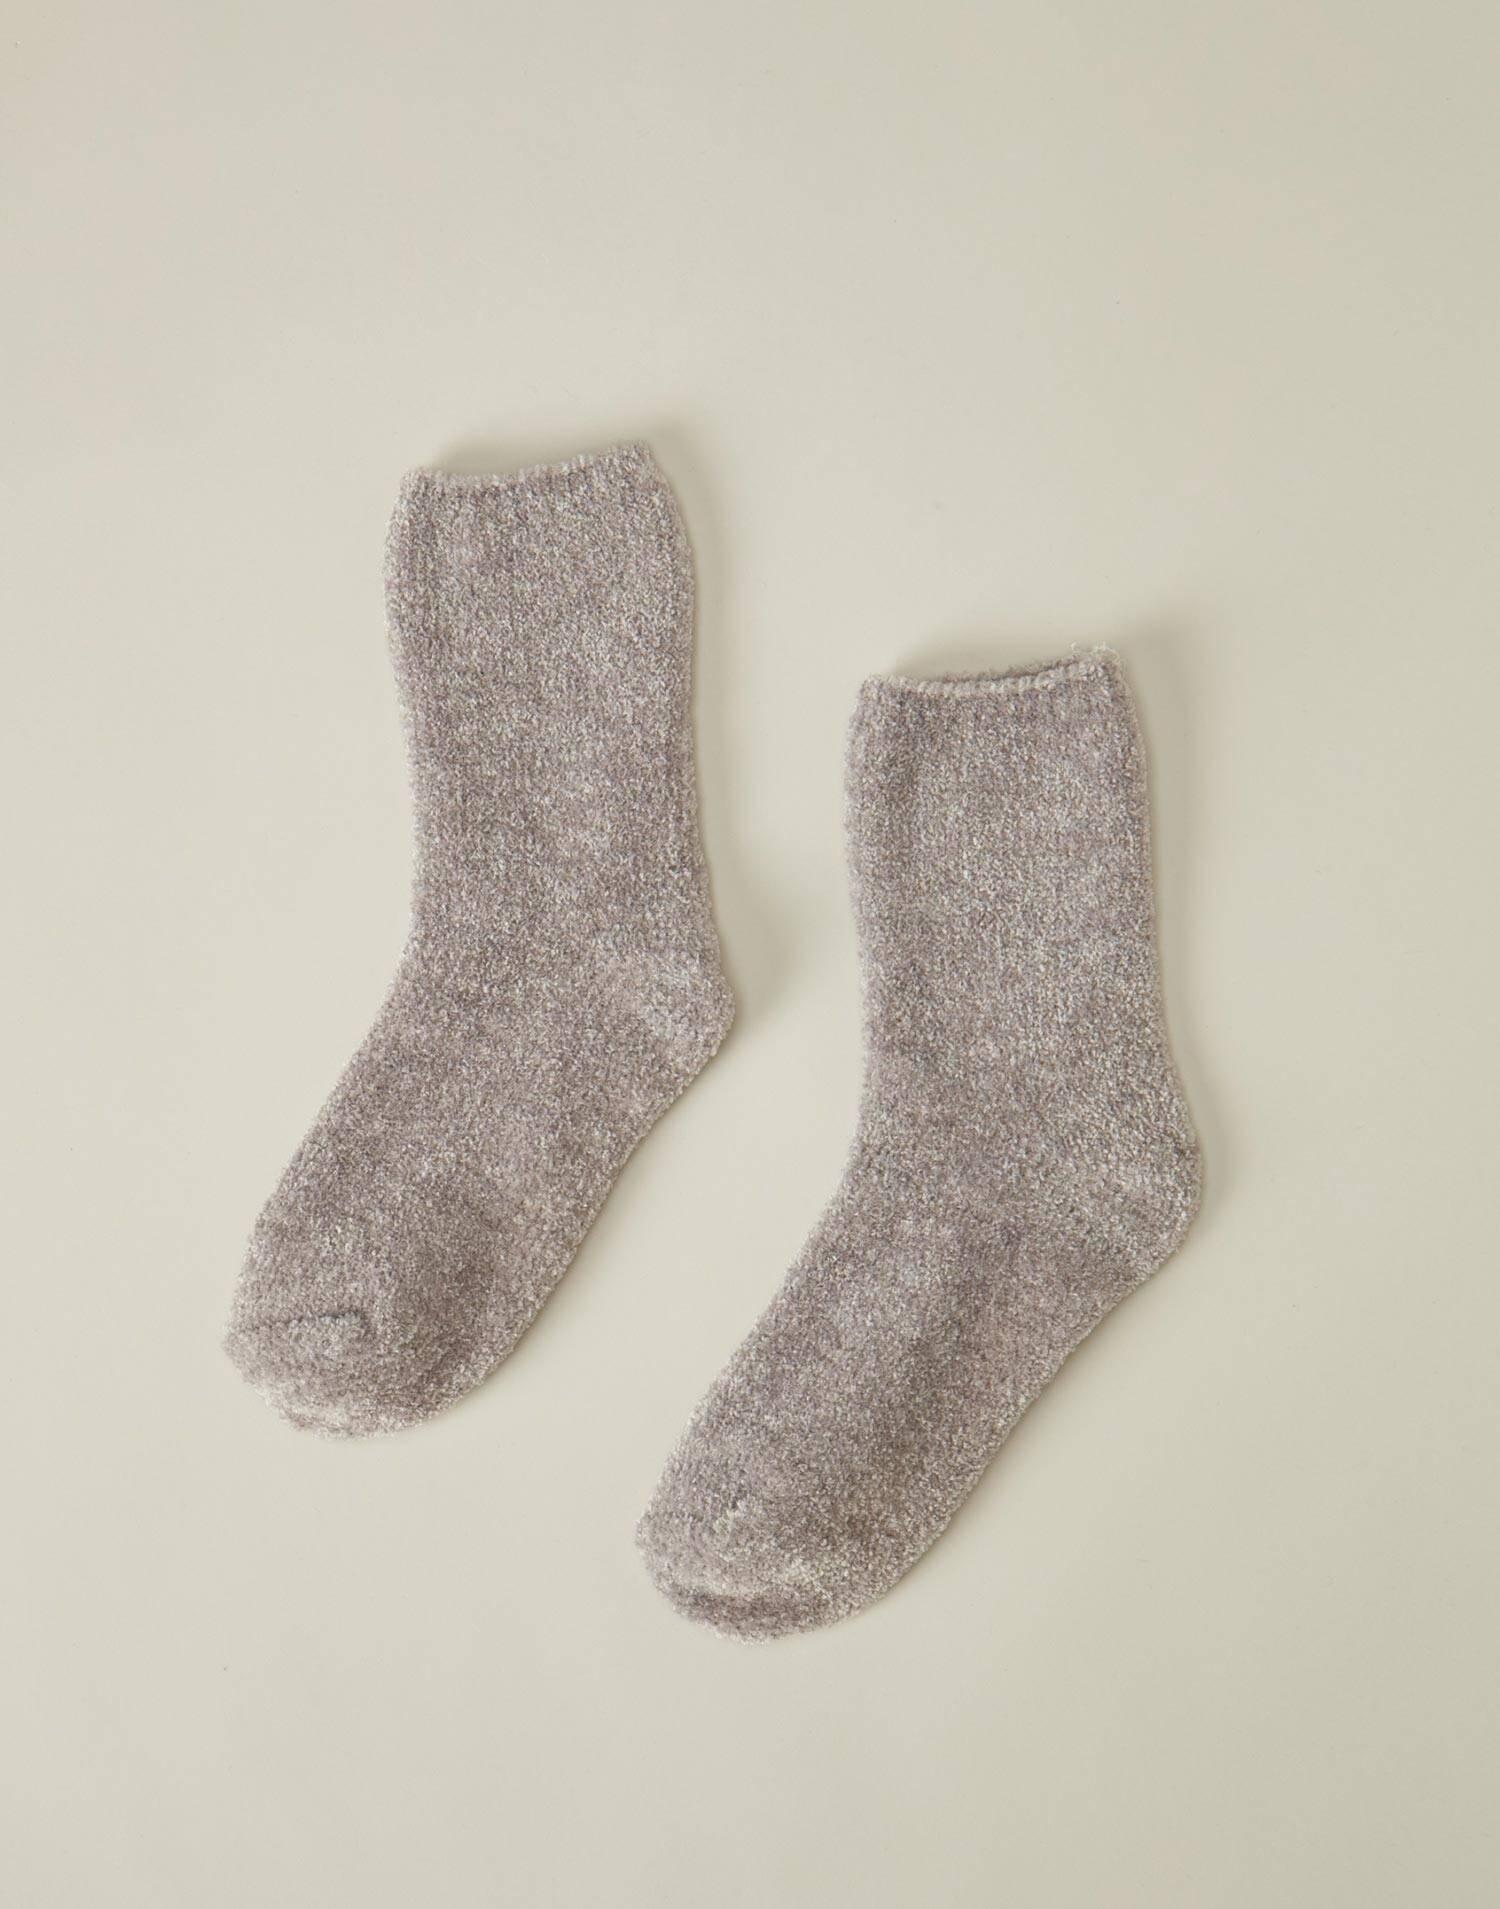 Thick fleece socks